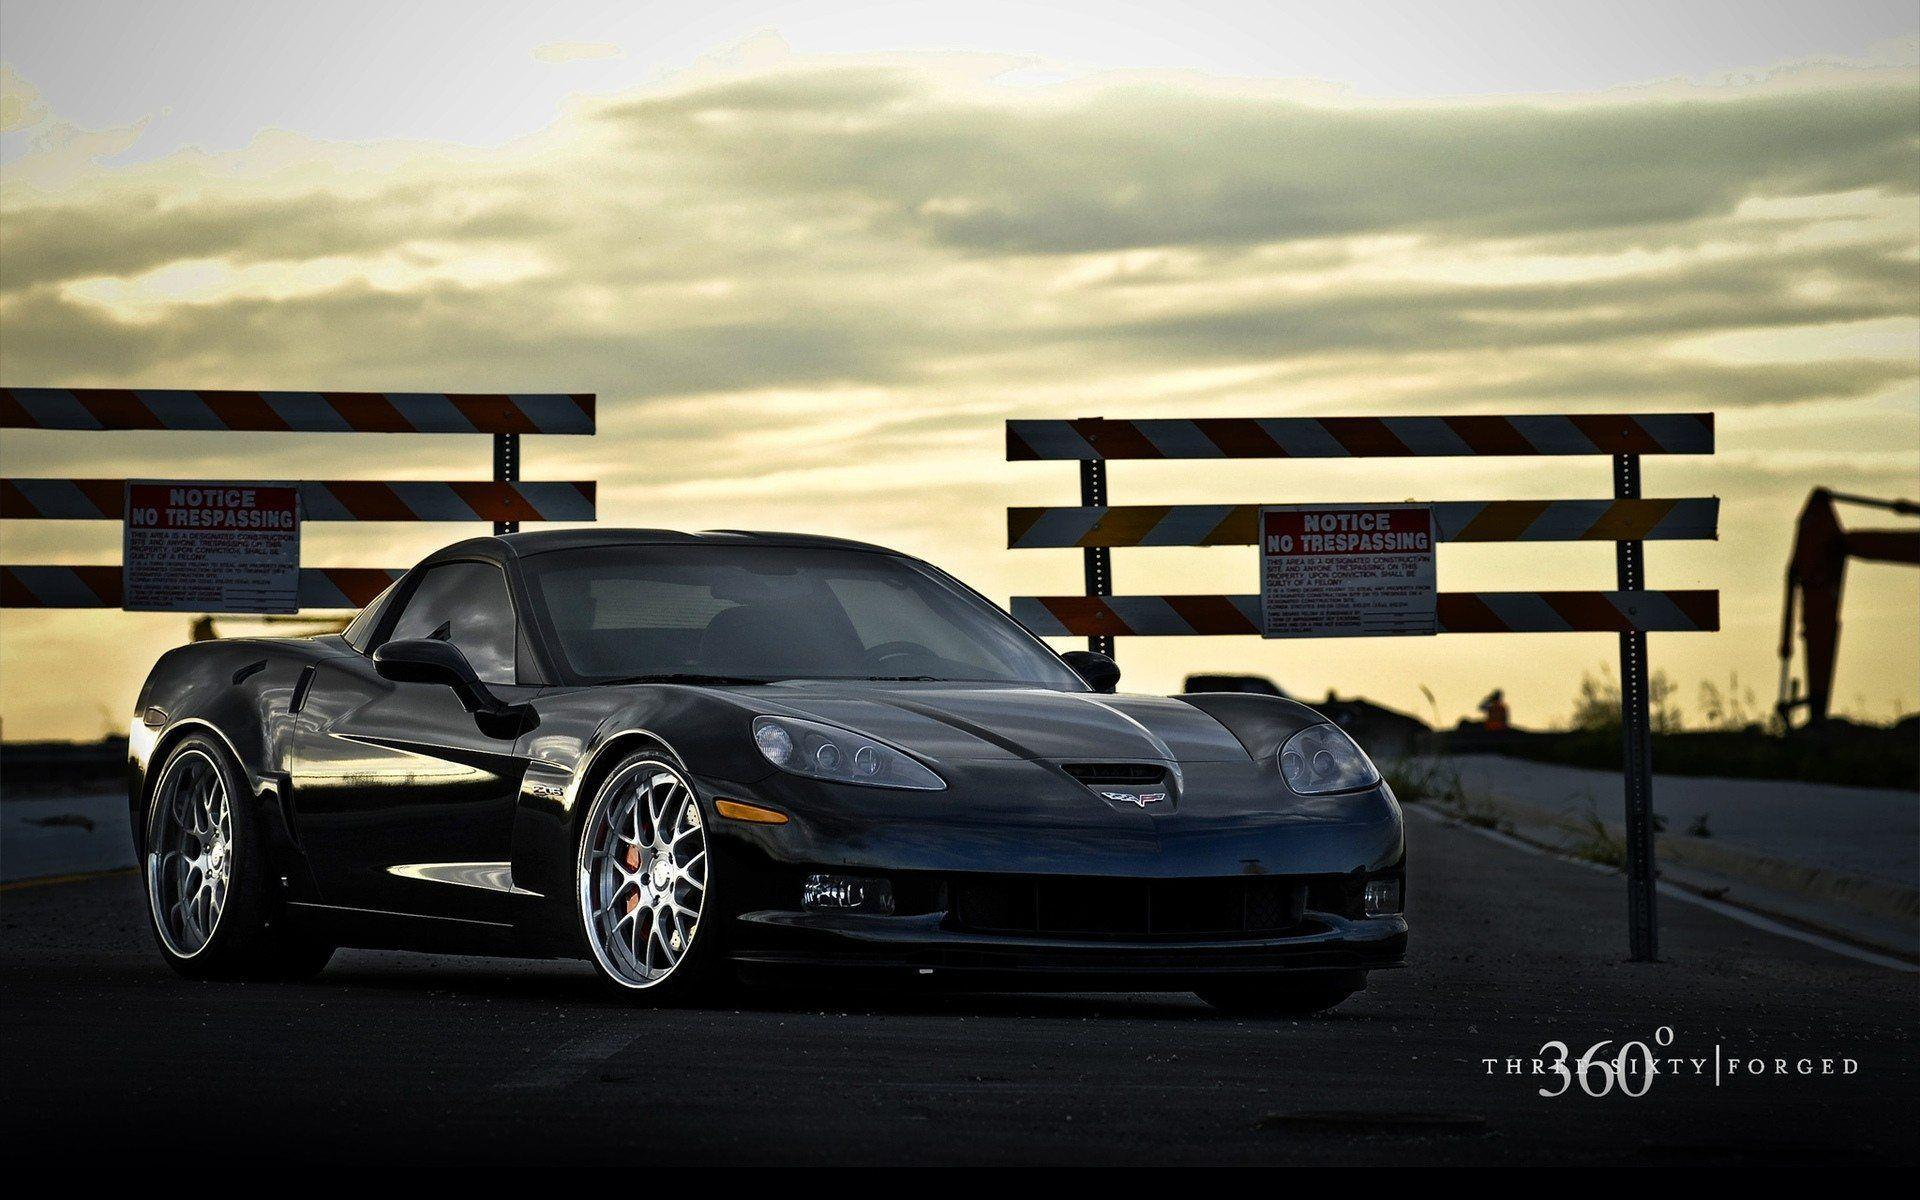 Kelebihan Corvette C6 Zr1 Harga